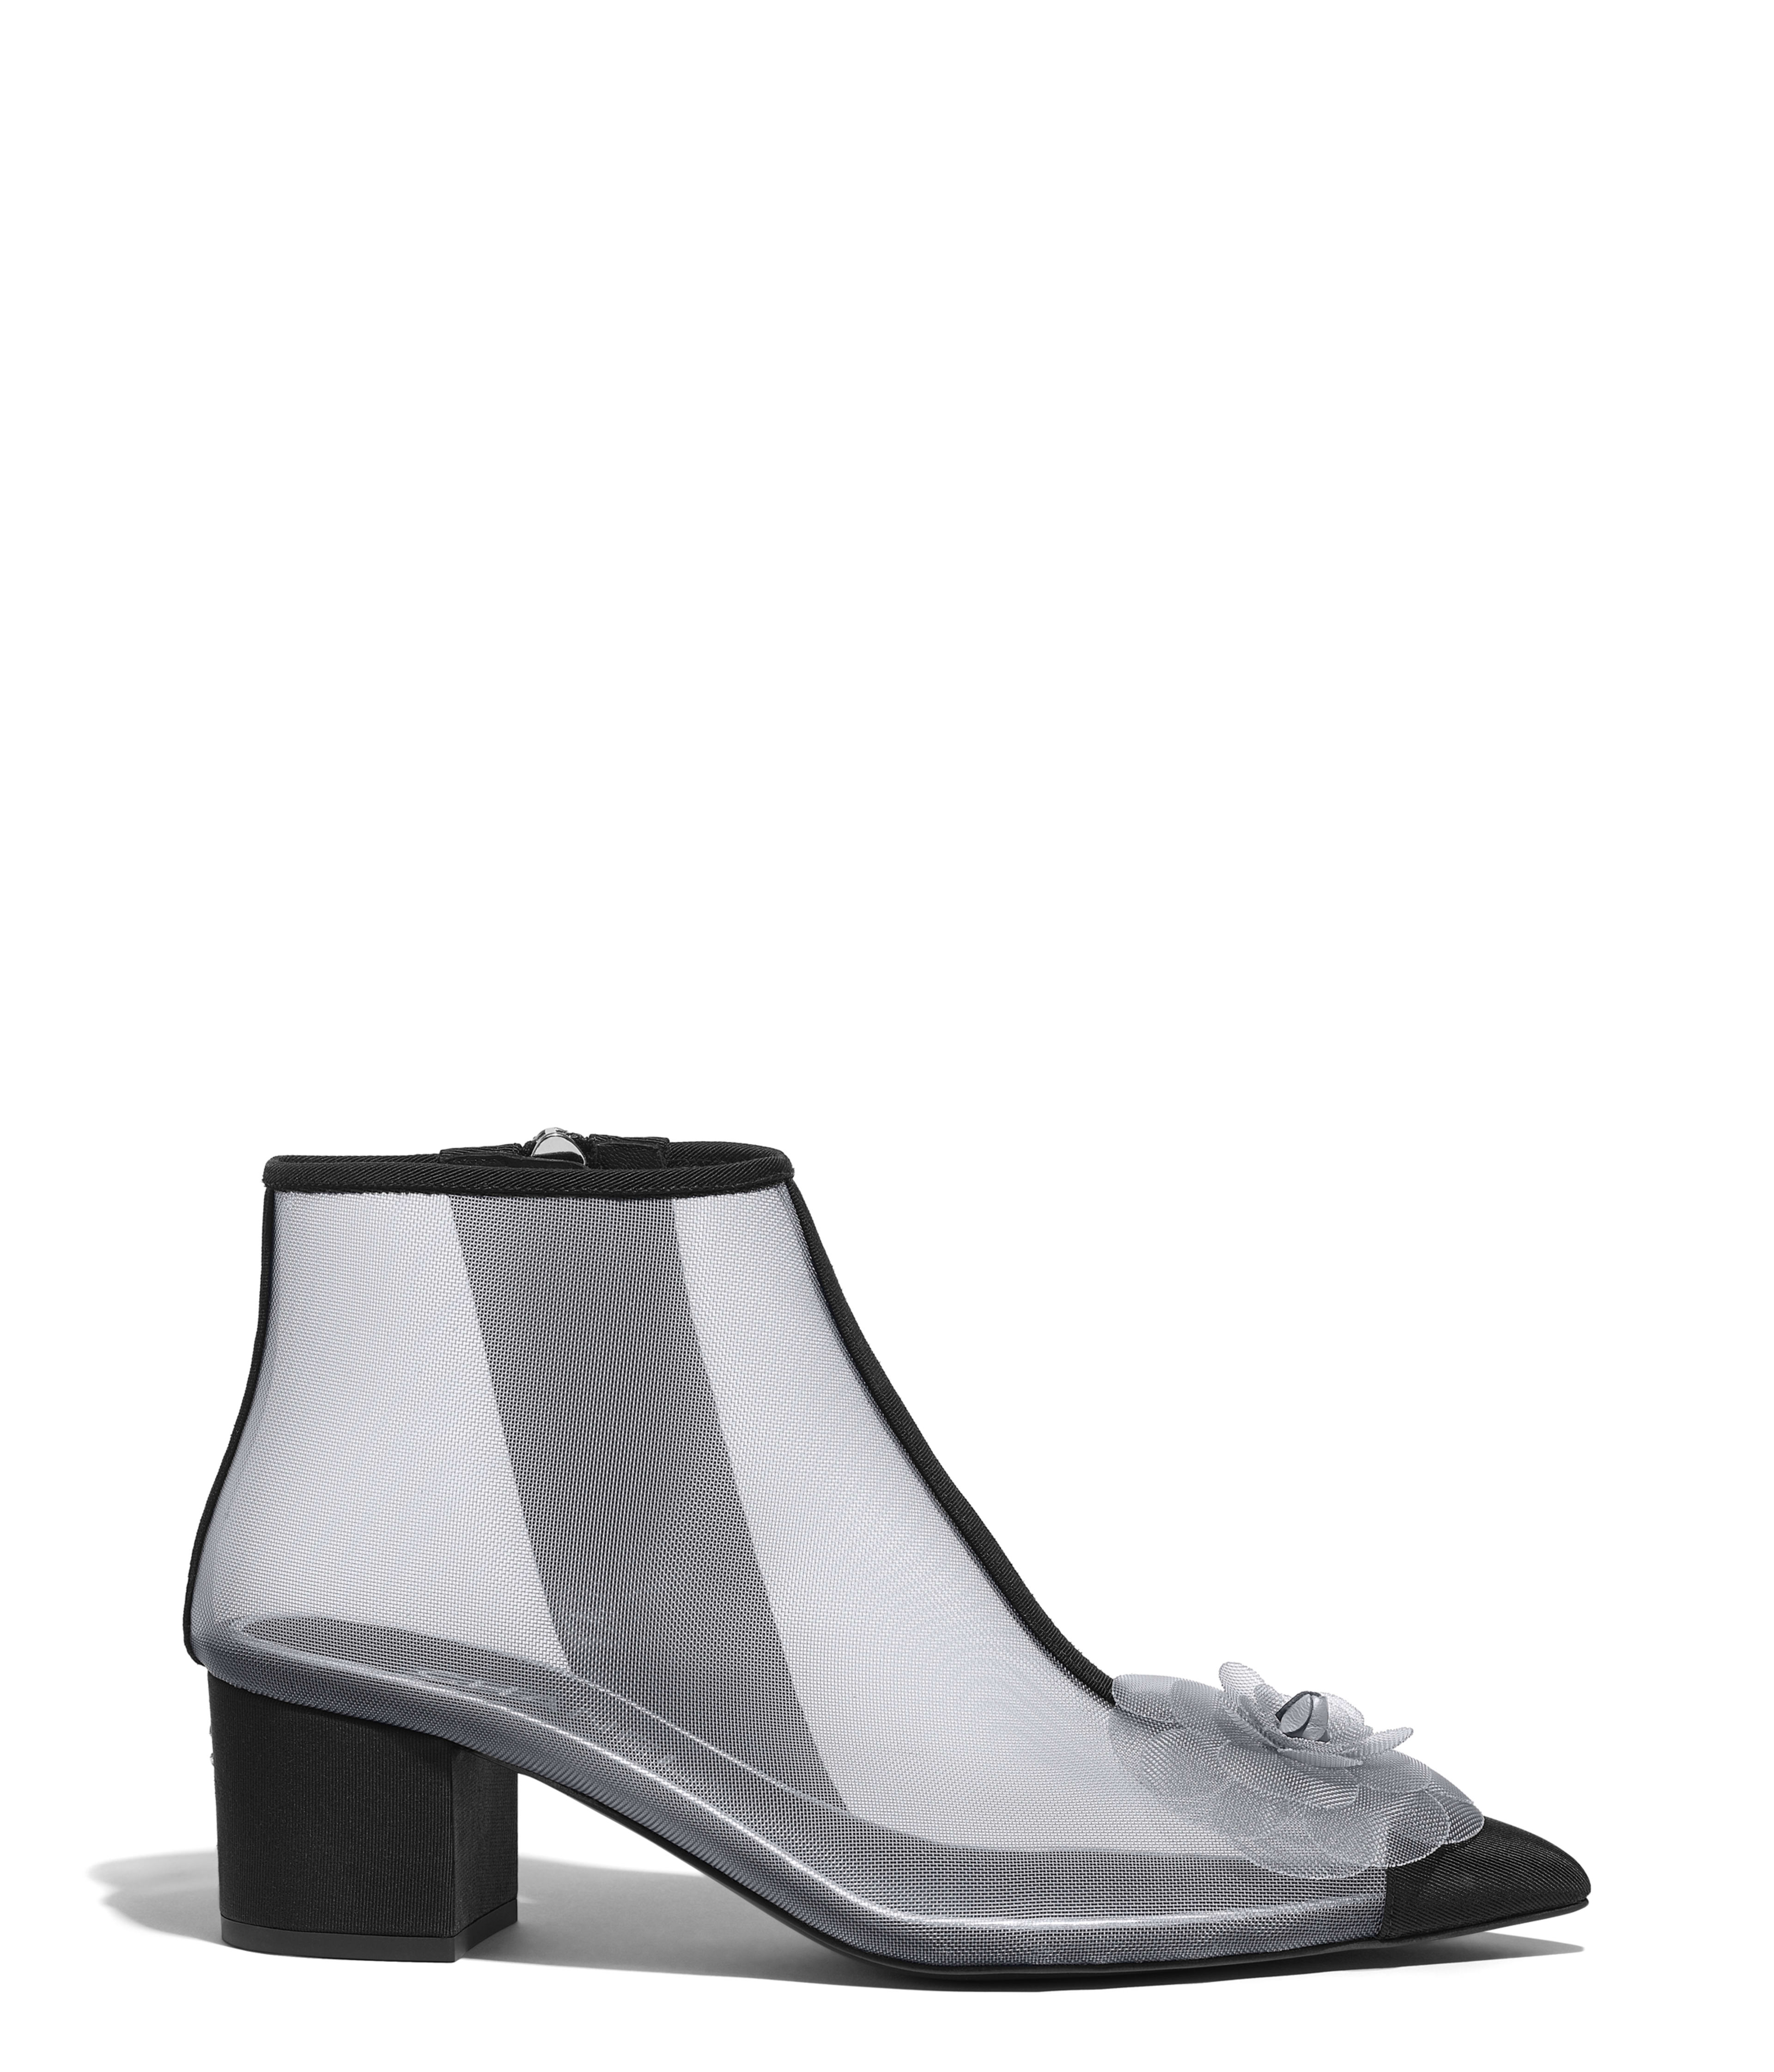 1379c7264 Ankle Boots Mesh & Grosgrain, Gray & Black Ref. G34544Y52423C1443